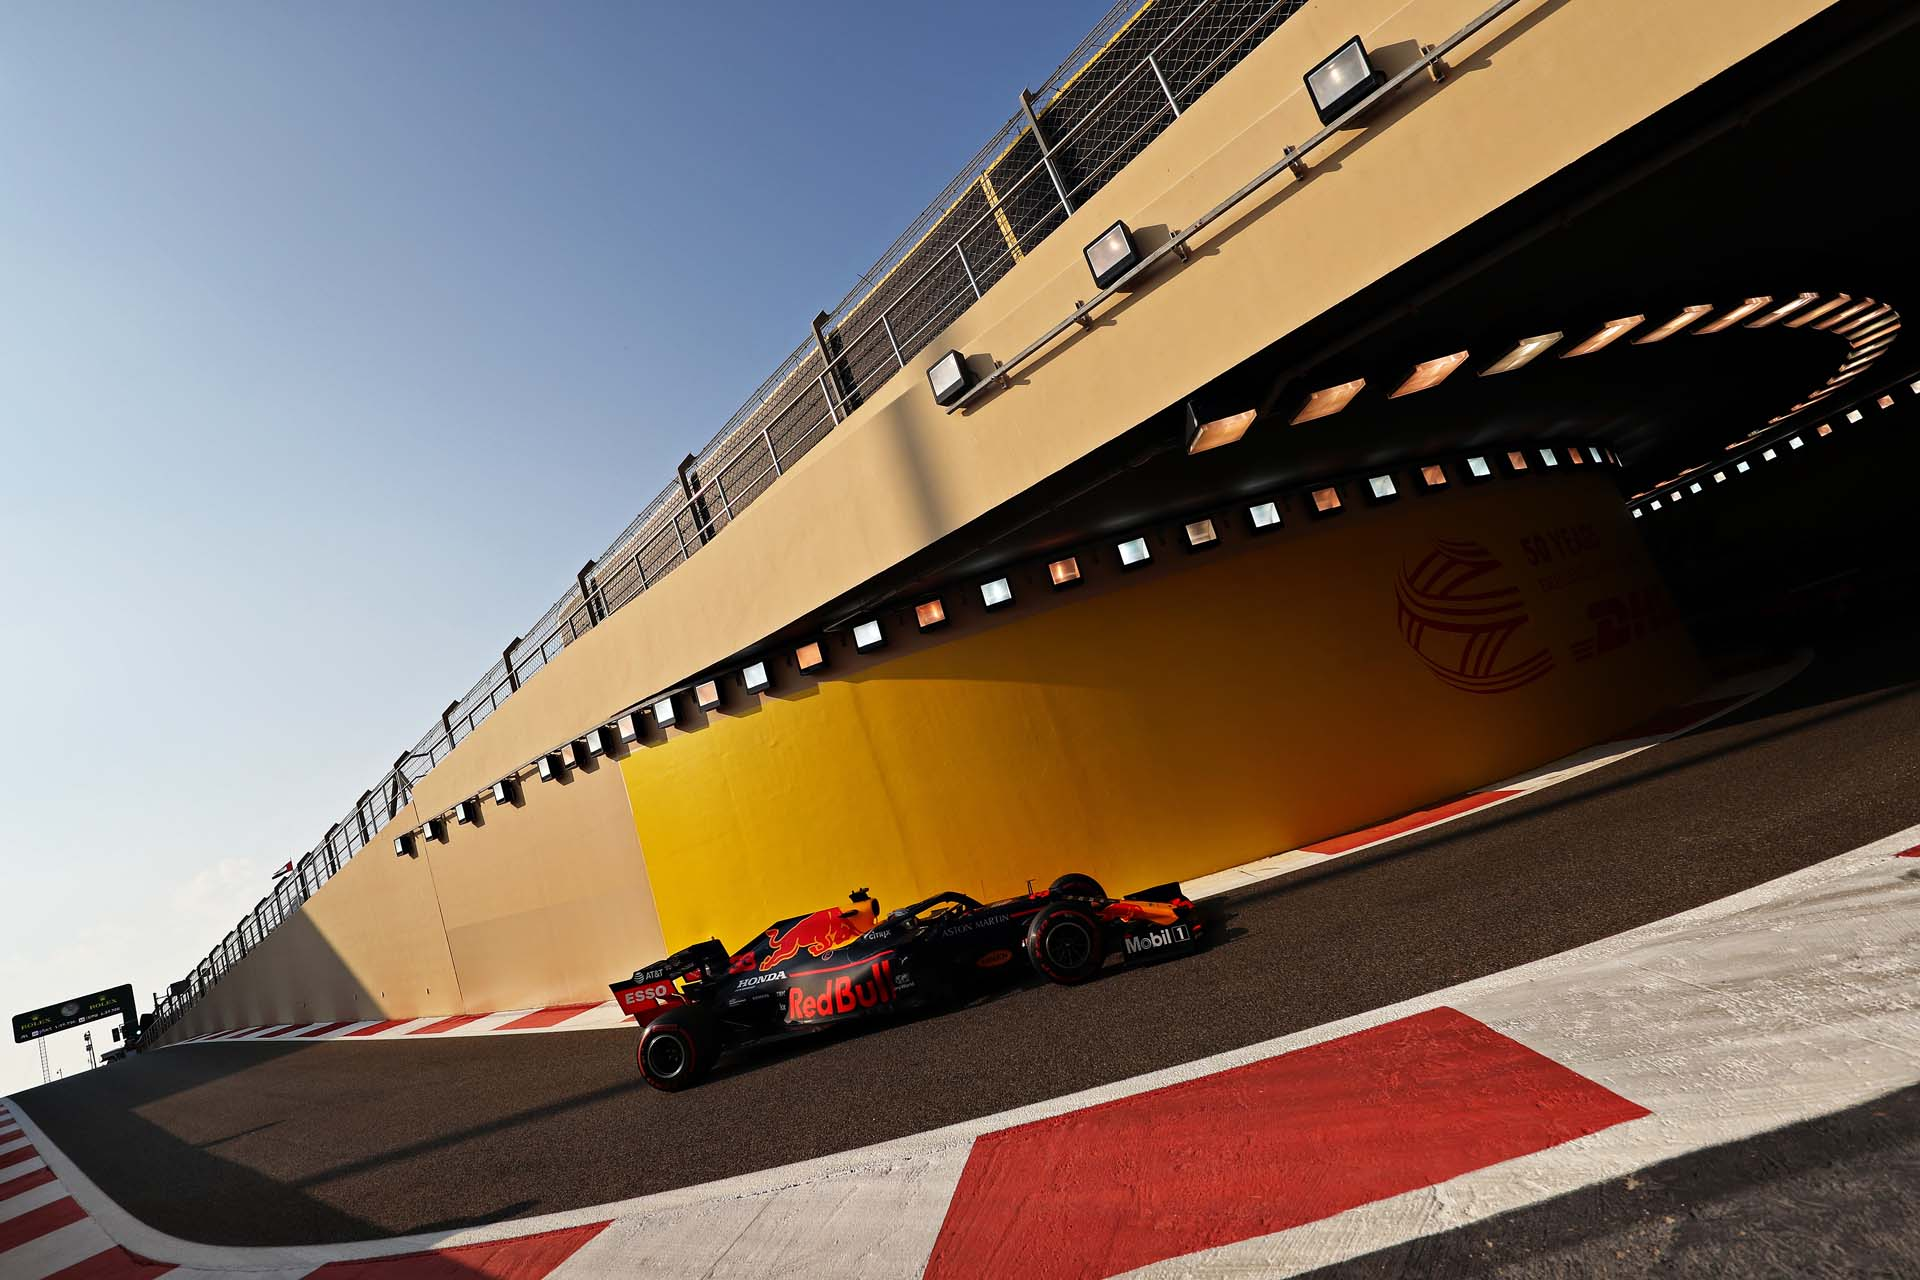 F1 Grand Prix of Abu Dhabi - Final Practice